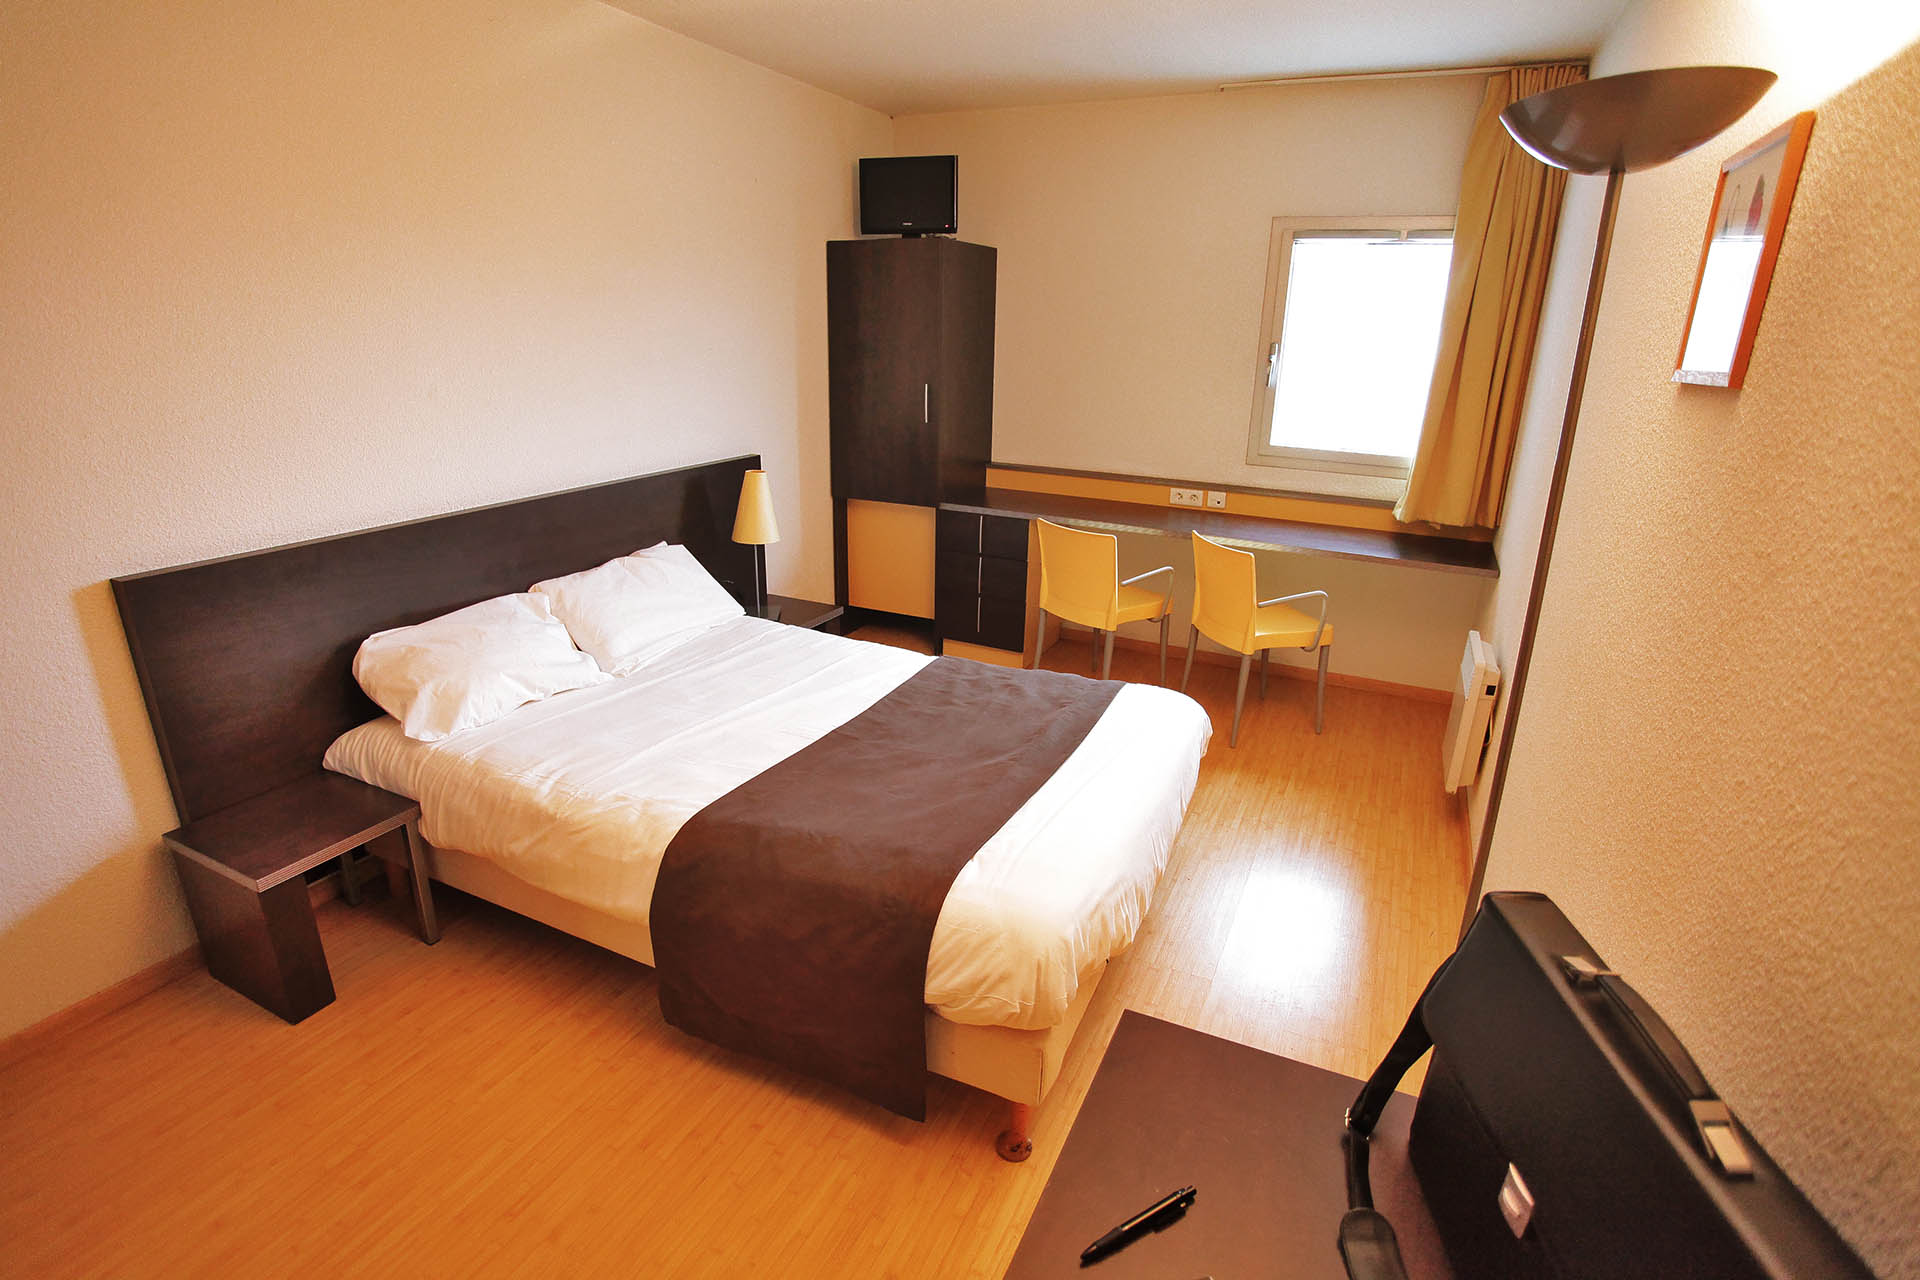 chambres studio grand lit apparthotel torcy. Black Bedroom Furniture Sets. Home Design Ideas